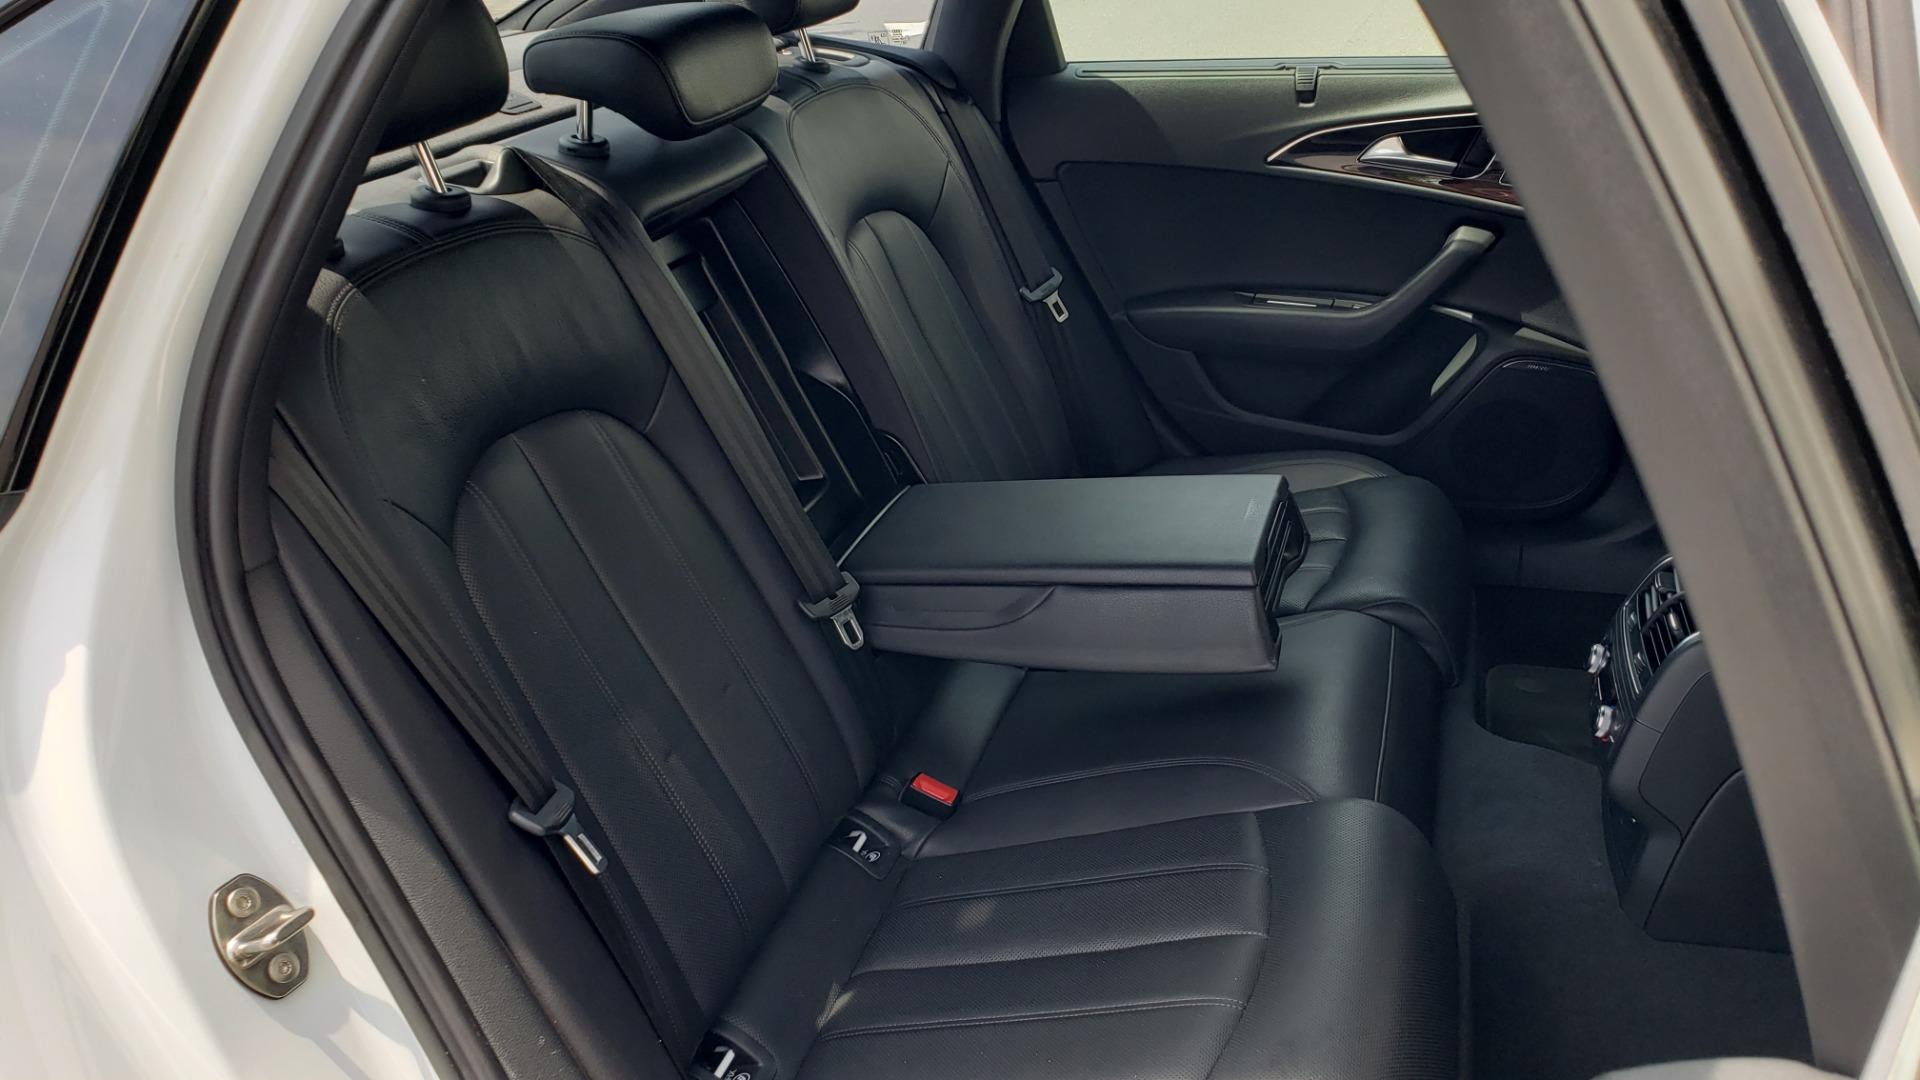 Used 2017 Audi A6 PRESTIGE SEDAN 3.0T / NAV / SUNROOF / BLACK OPTIC / CLD WTHR / REARVIEW for sale $30,797 at Formula Imports in Charlotte NC 28227 75